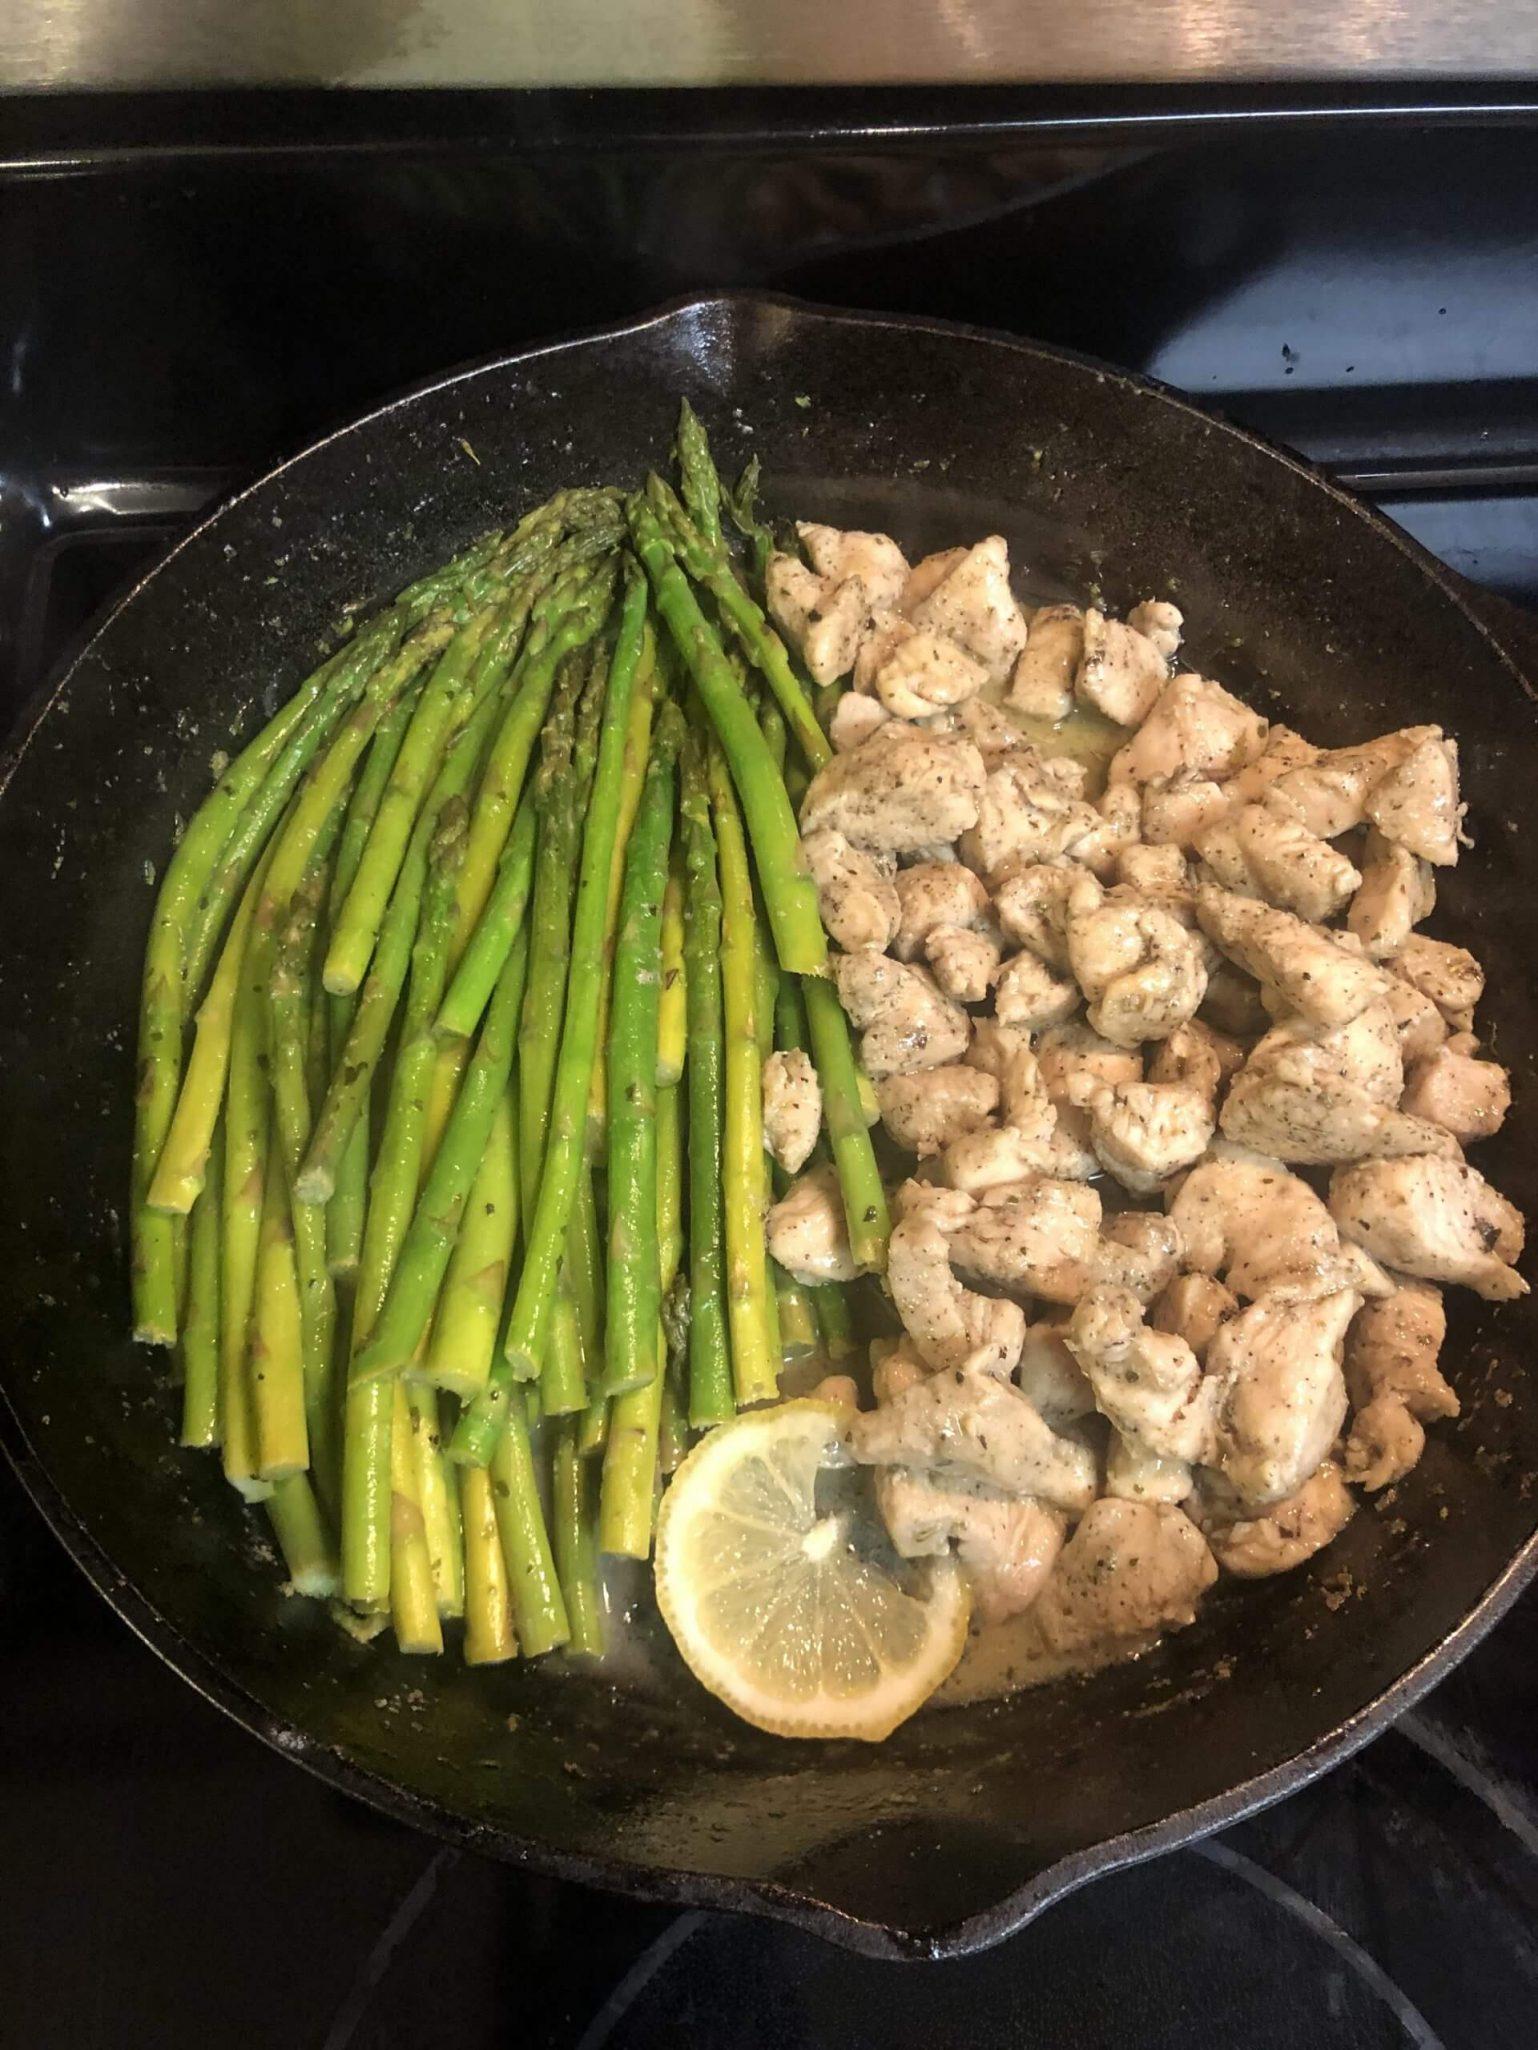 Garlic Butter Chicken & Lemon Asparagus Skillet